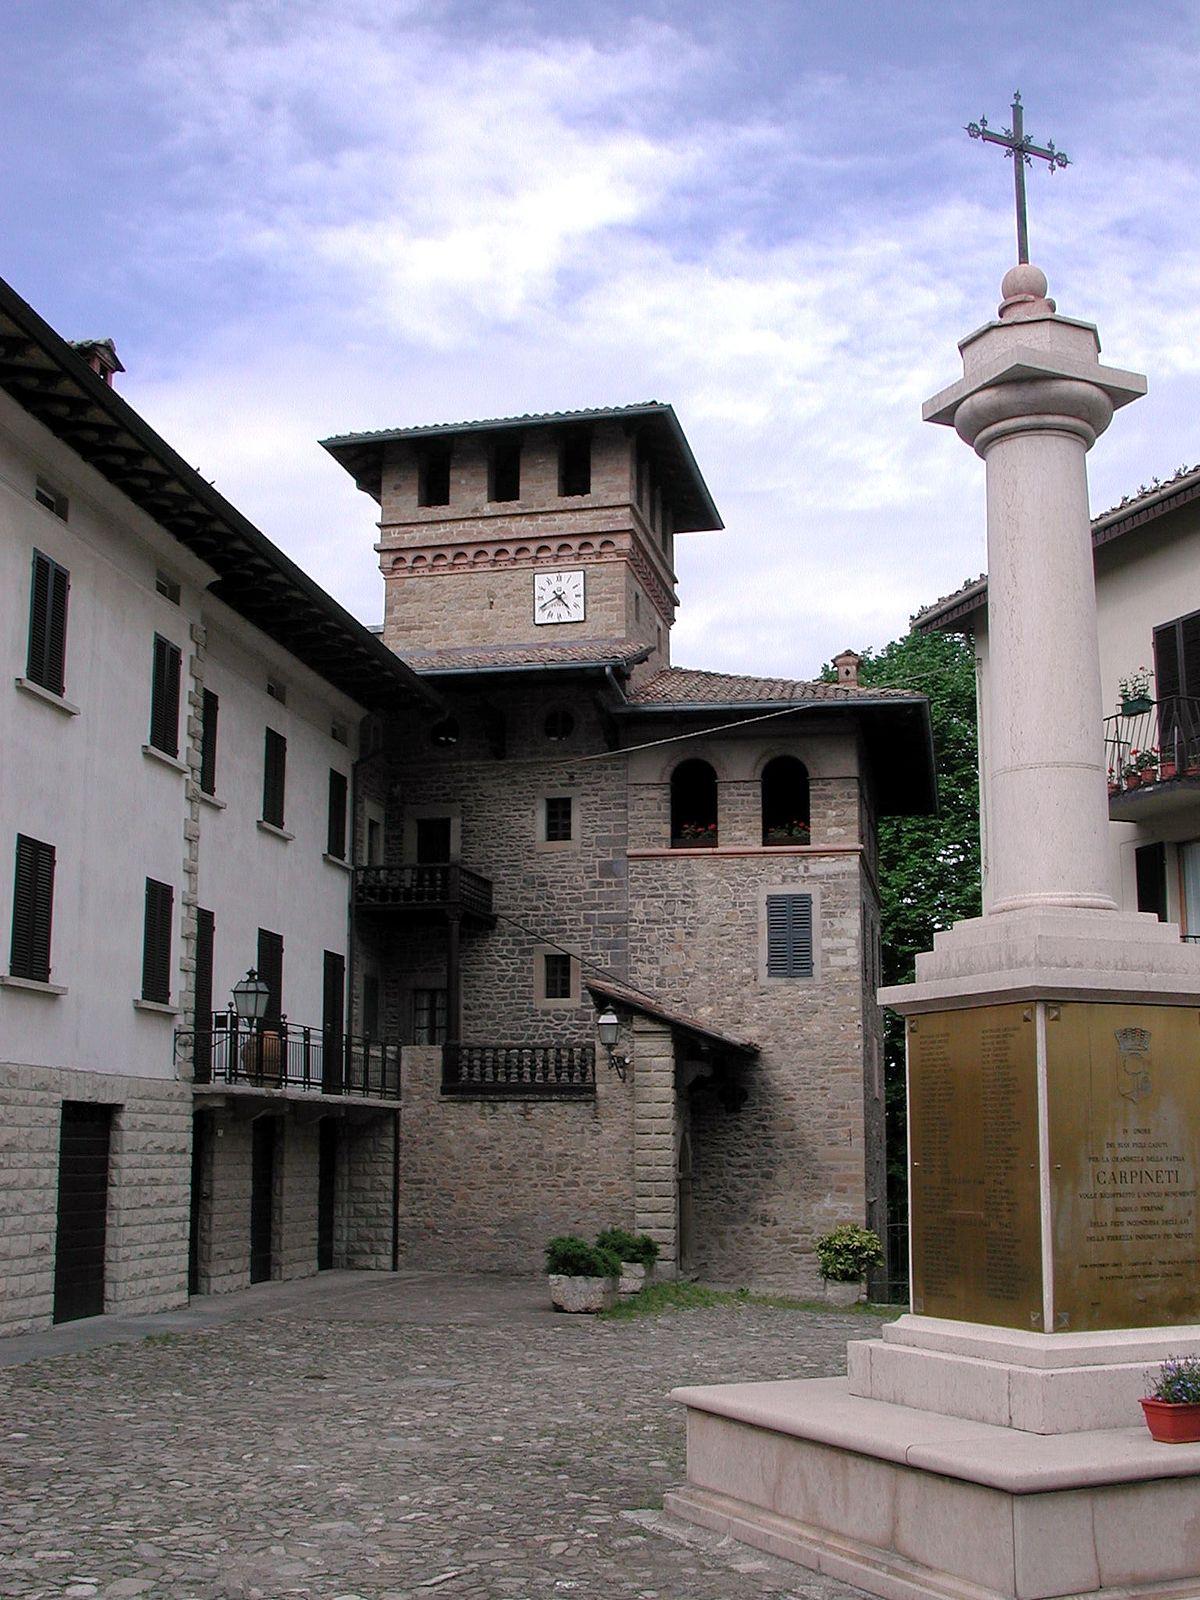 Carpineti Wikimedia Commons